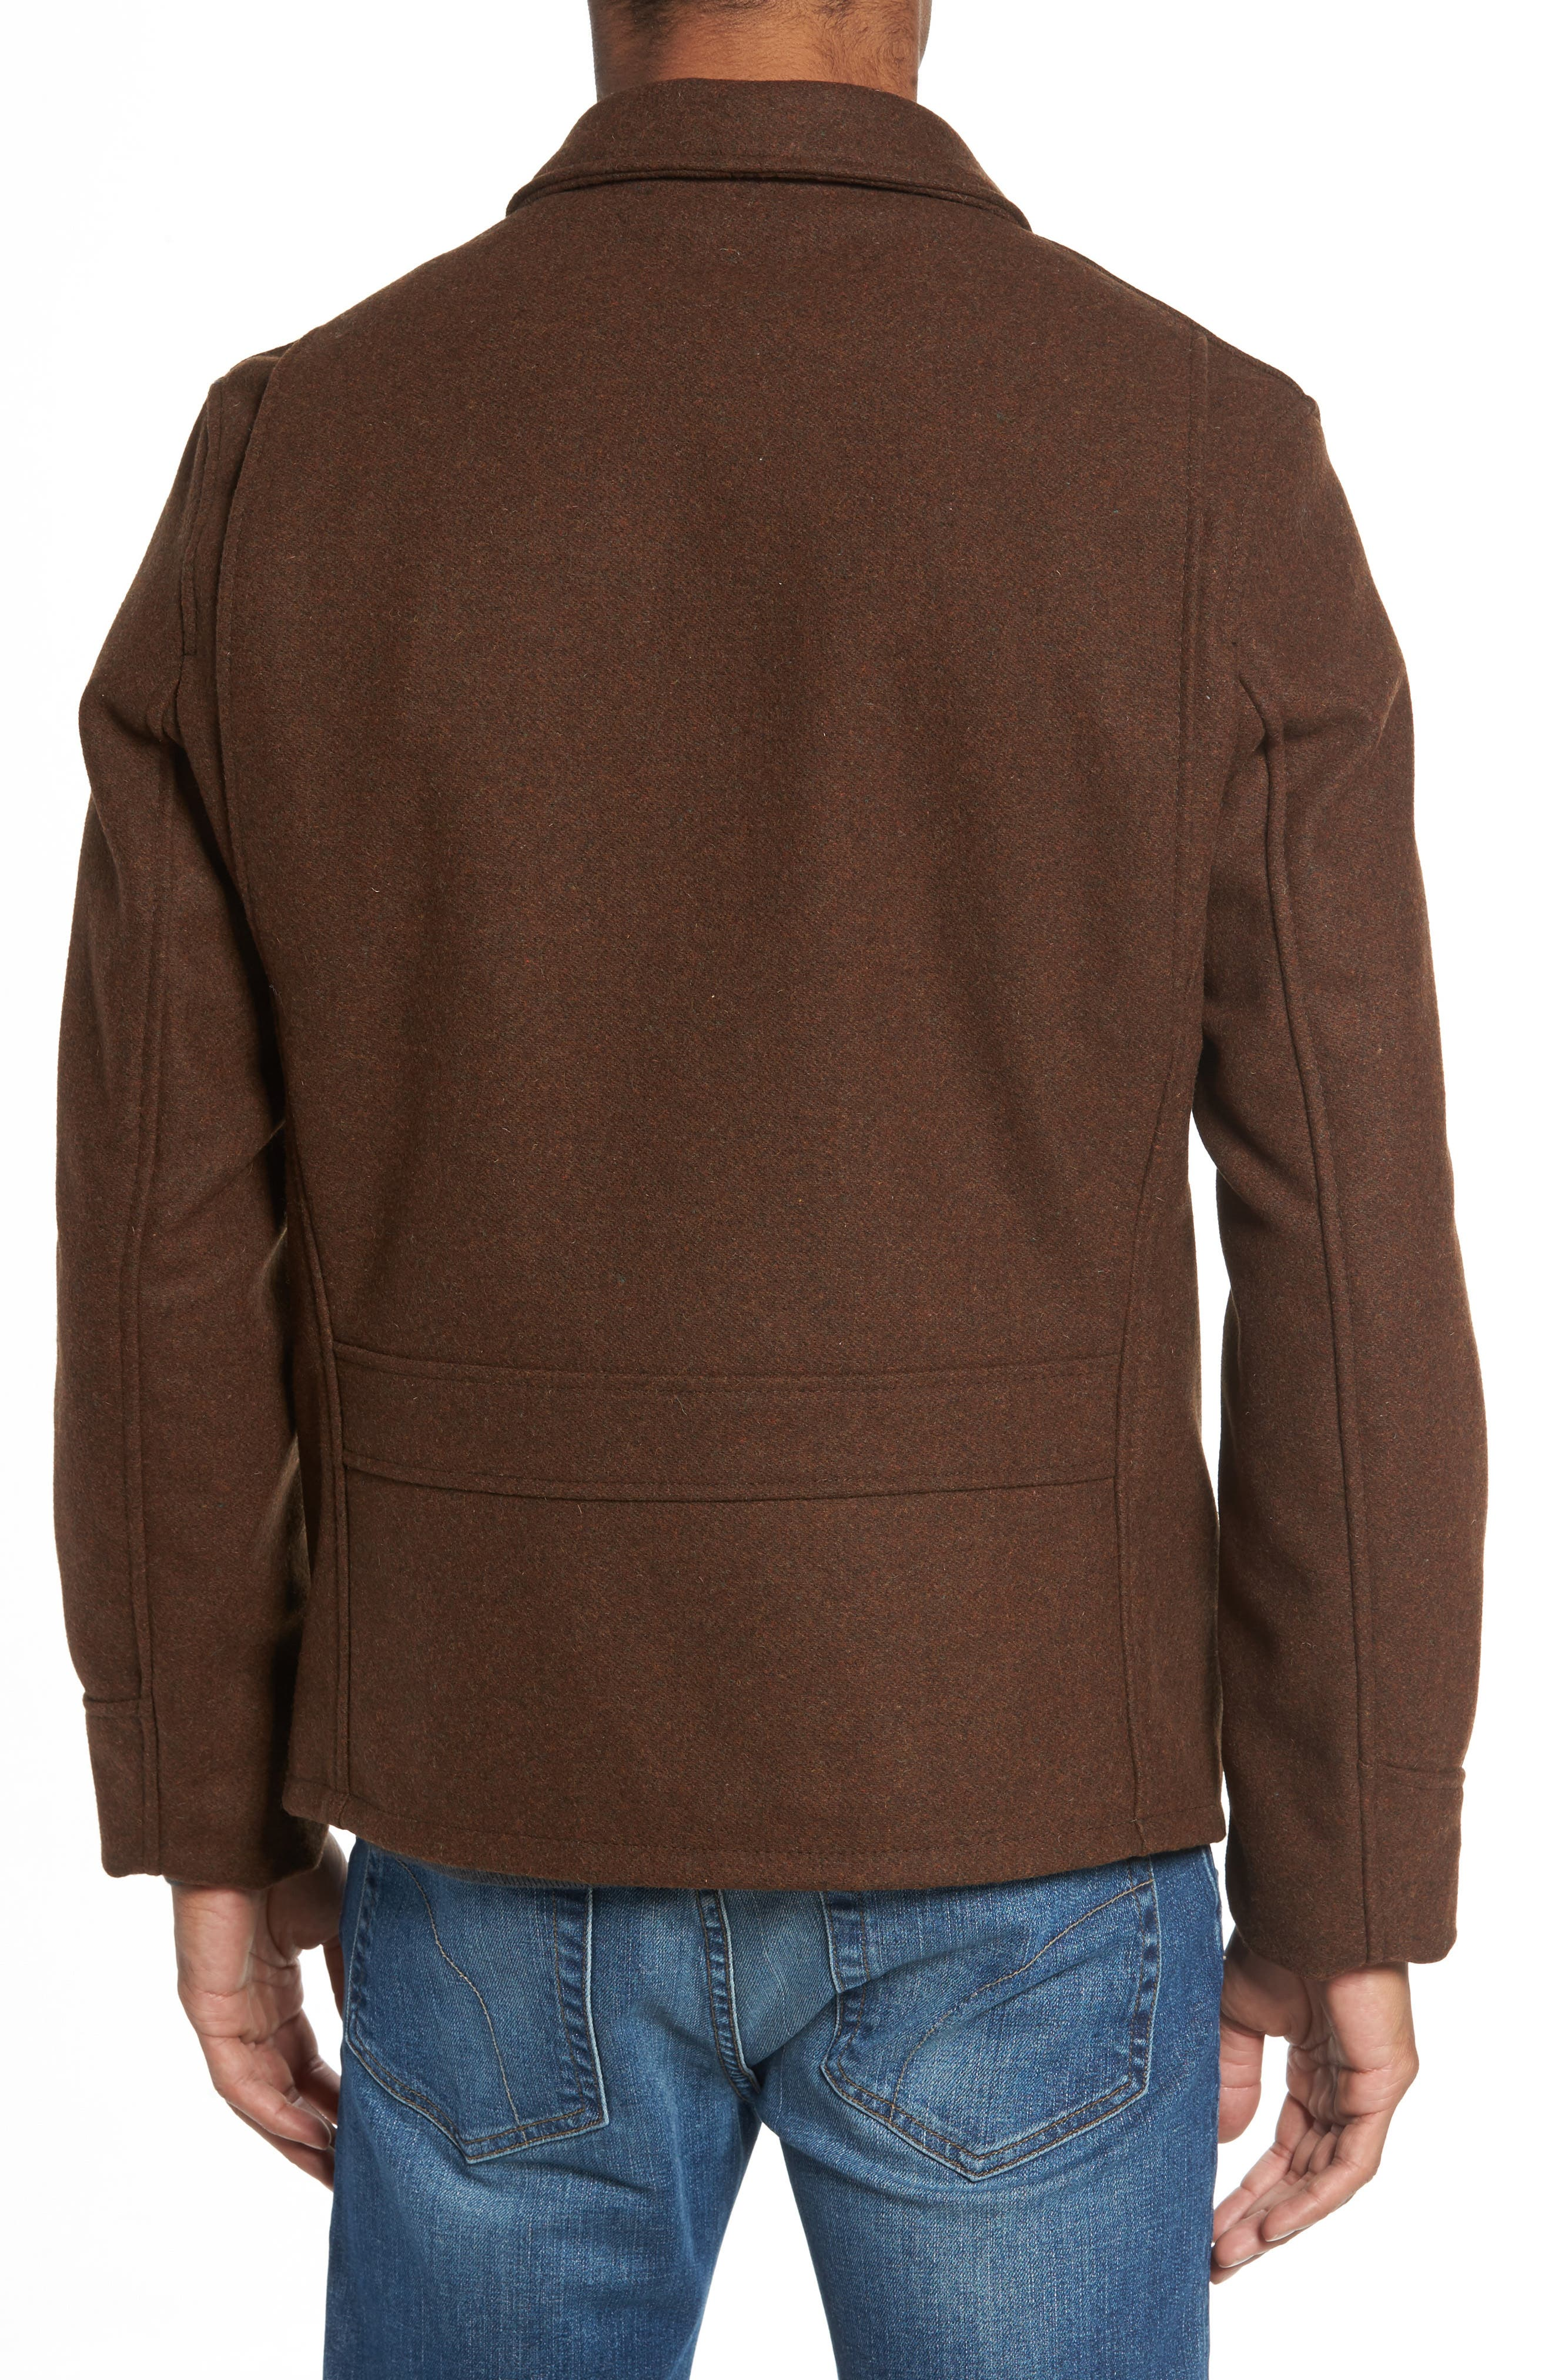 Liberty Wool Blend Zip Front Jacket,                             Alternate thumbnail 2, color,                             Brown